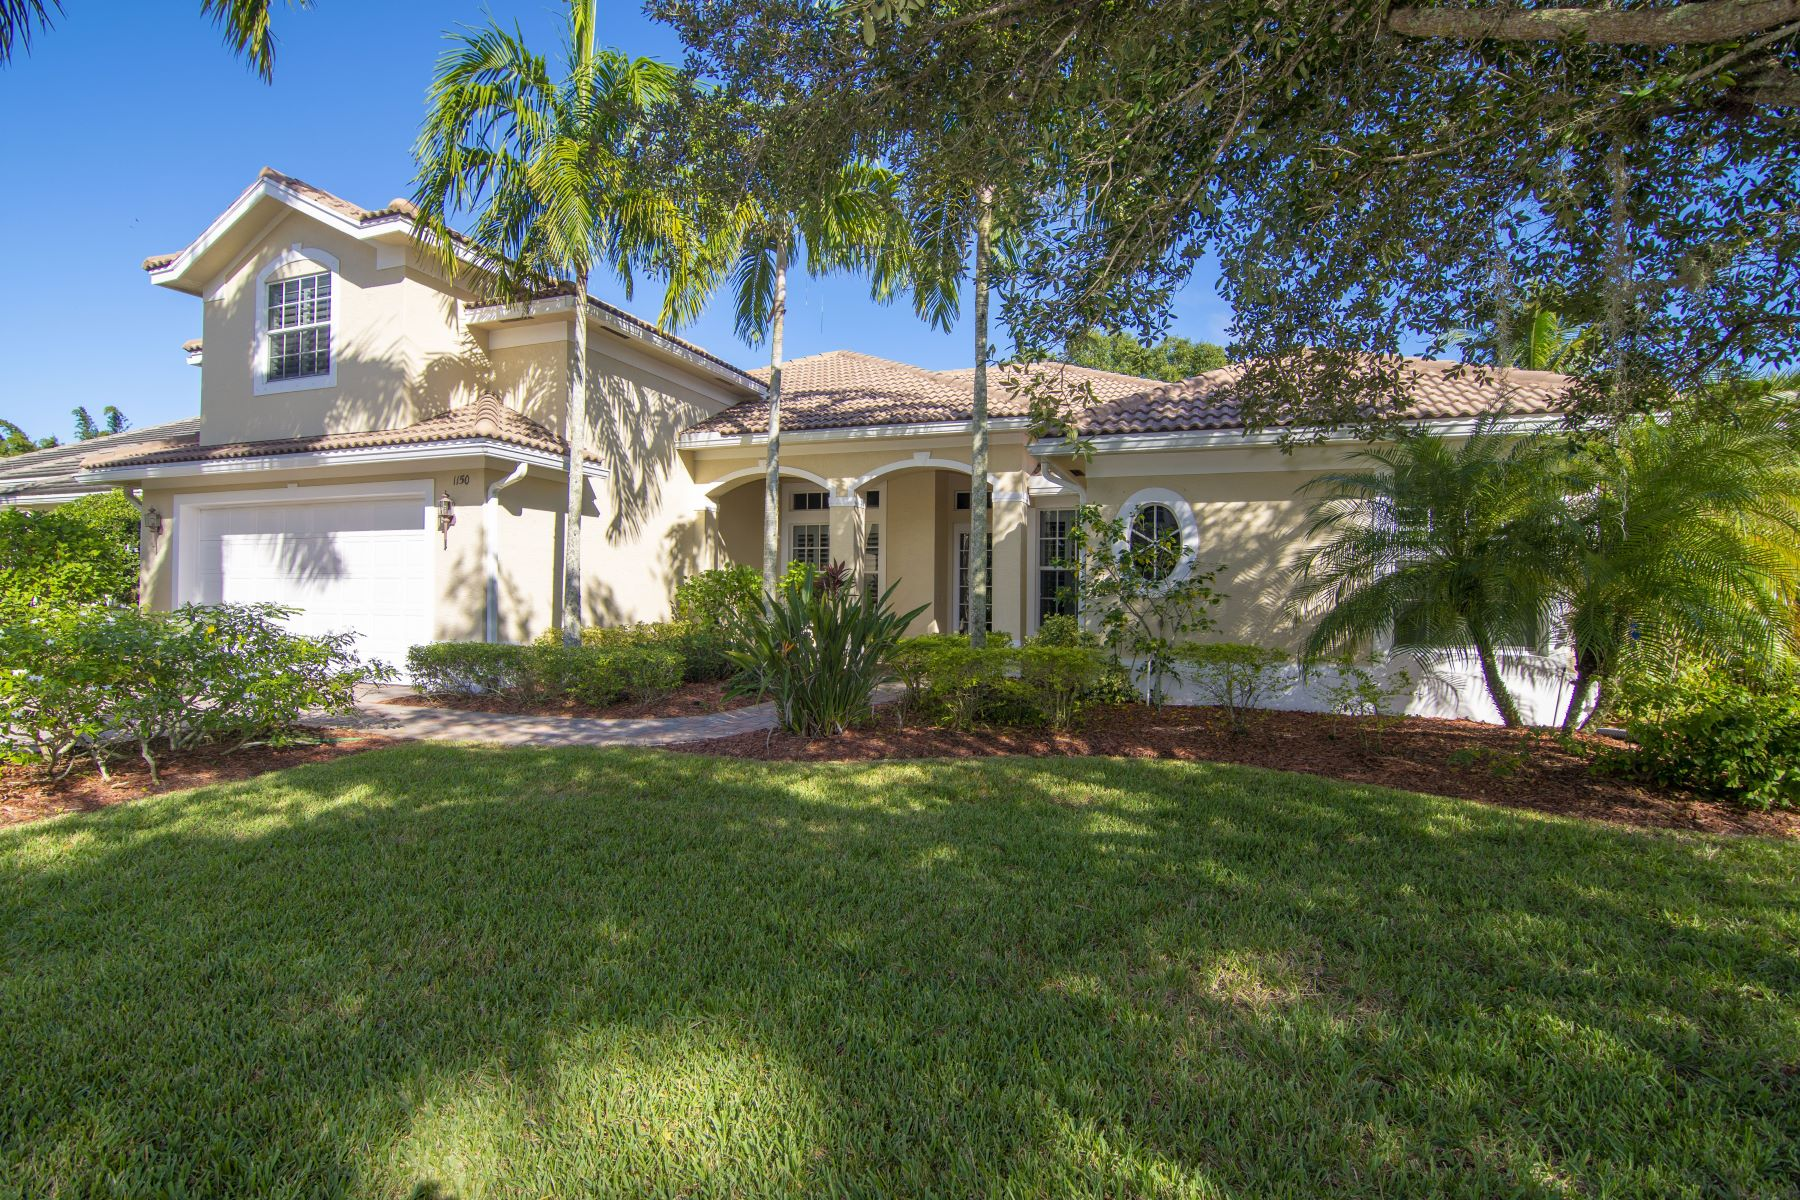 Property for Sale at 1150 Buckhead Drive Sw Vero Beach, Florida 32968 United States